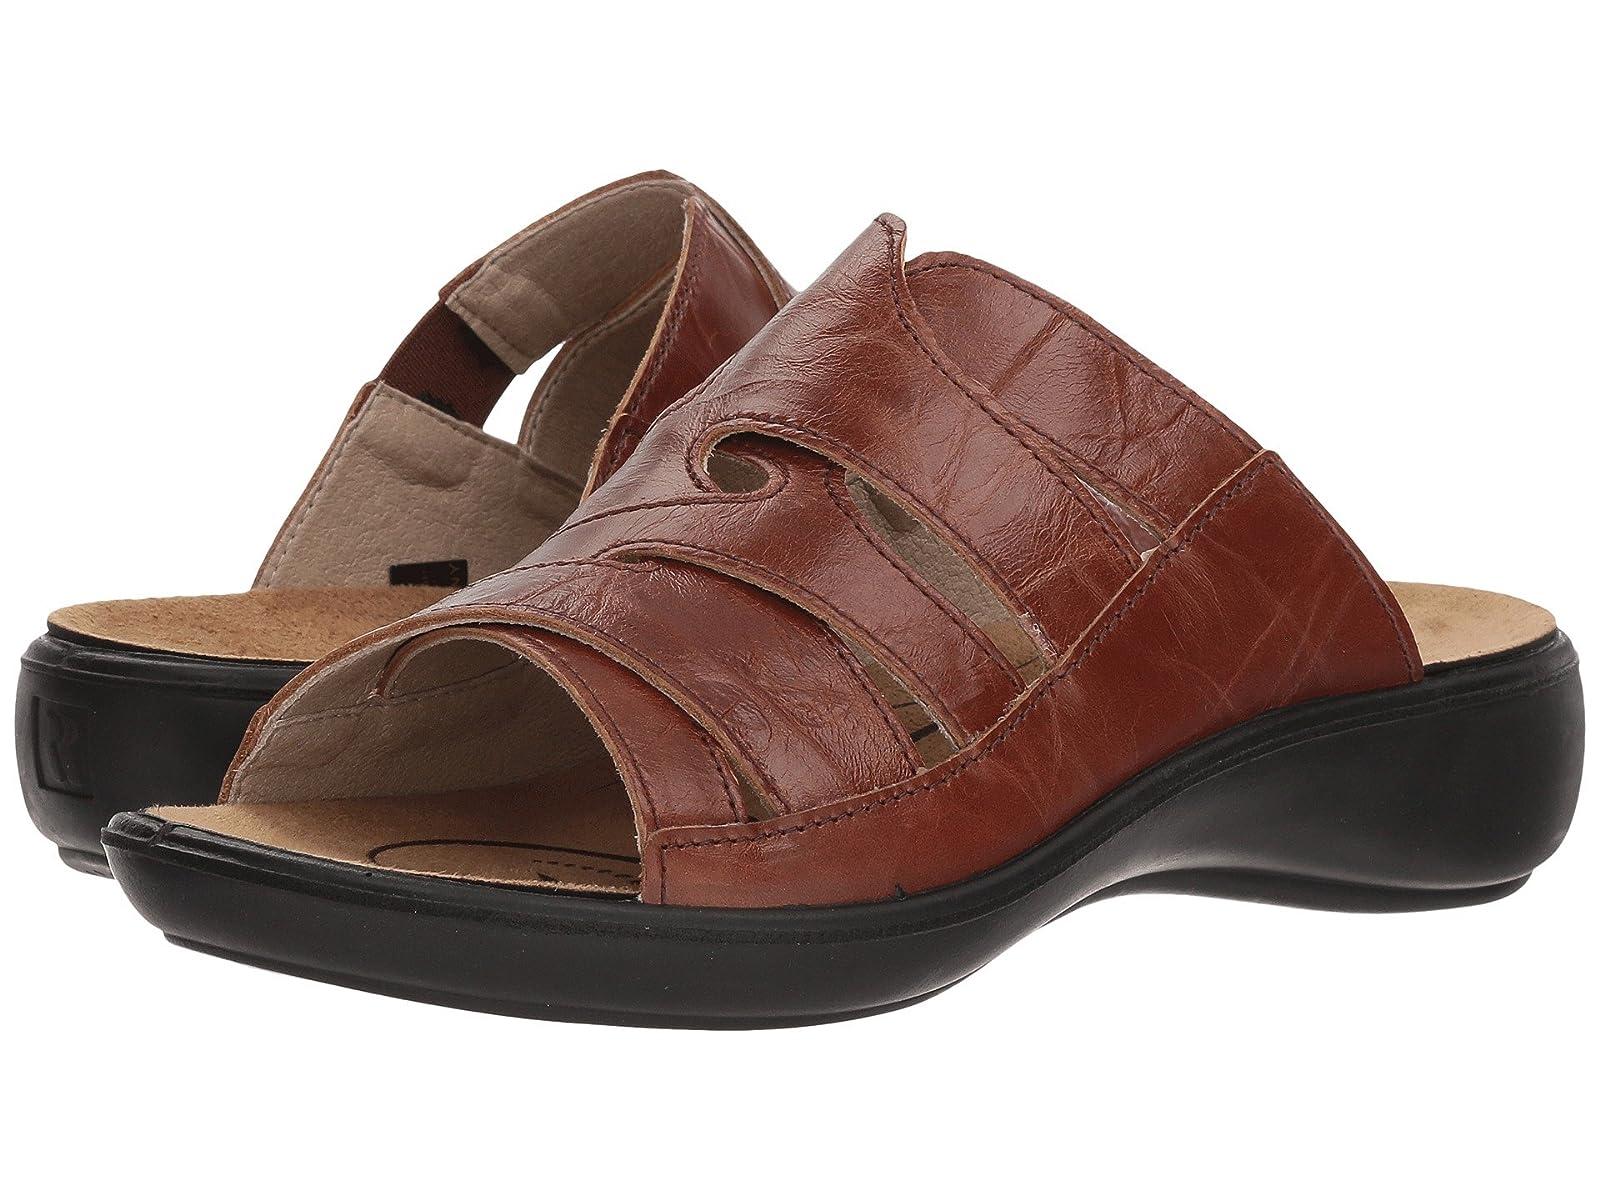 Romika Ibiza 87Cheap and distinctive eye-catching shoes